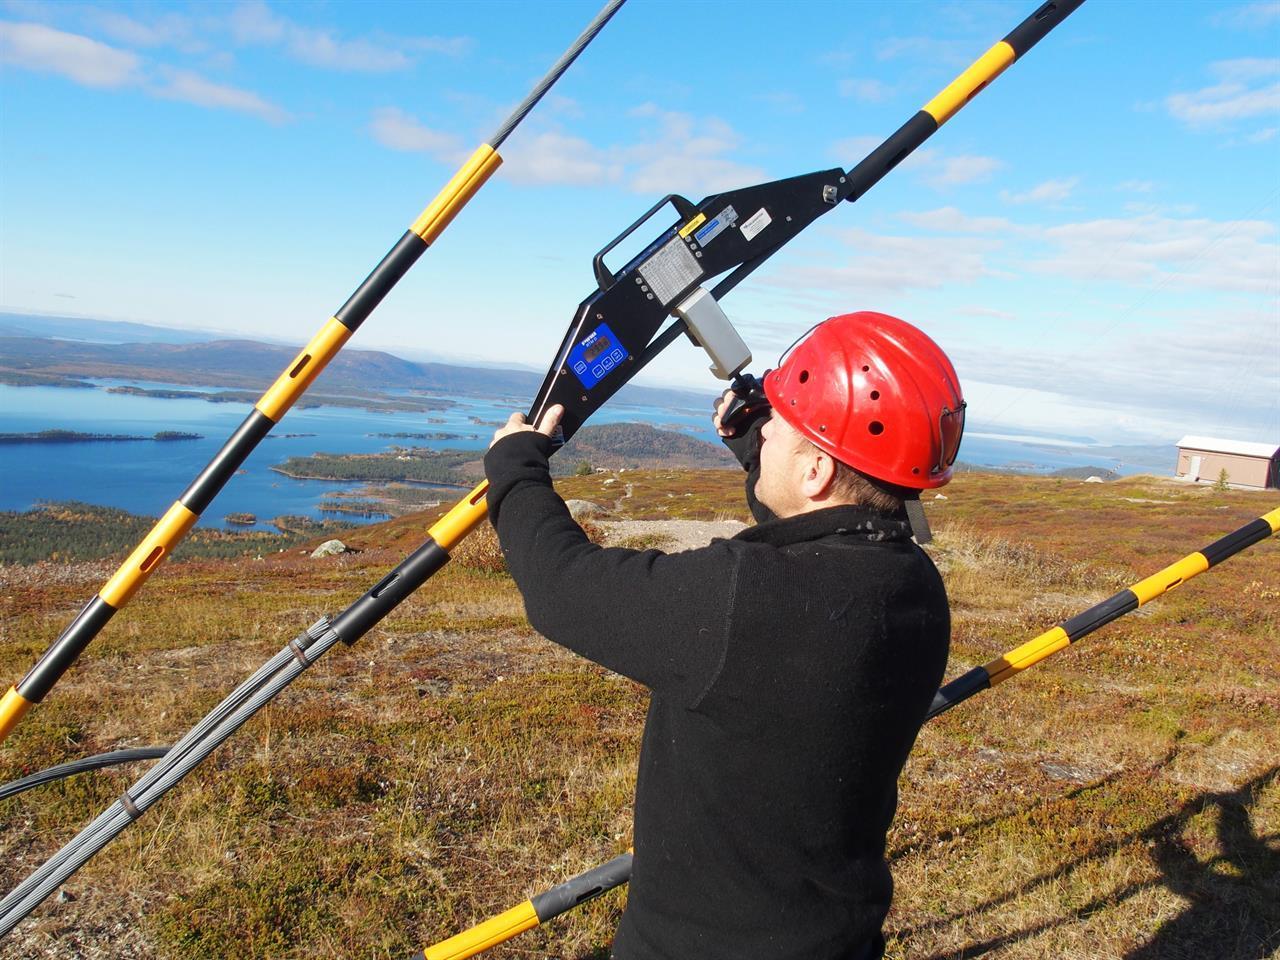 PIAB/Gigasense Staglinemätare, linkraftmätare, The PIAB Rope Tenson Meter RTM-D